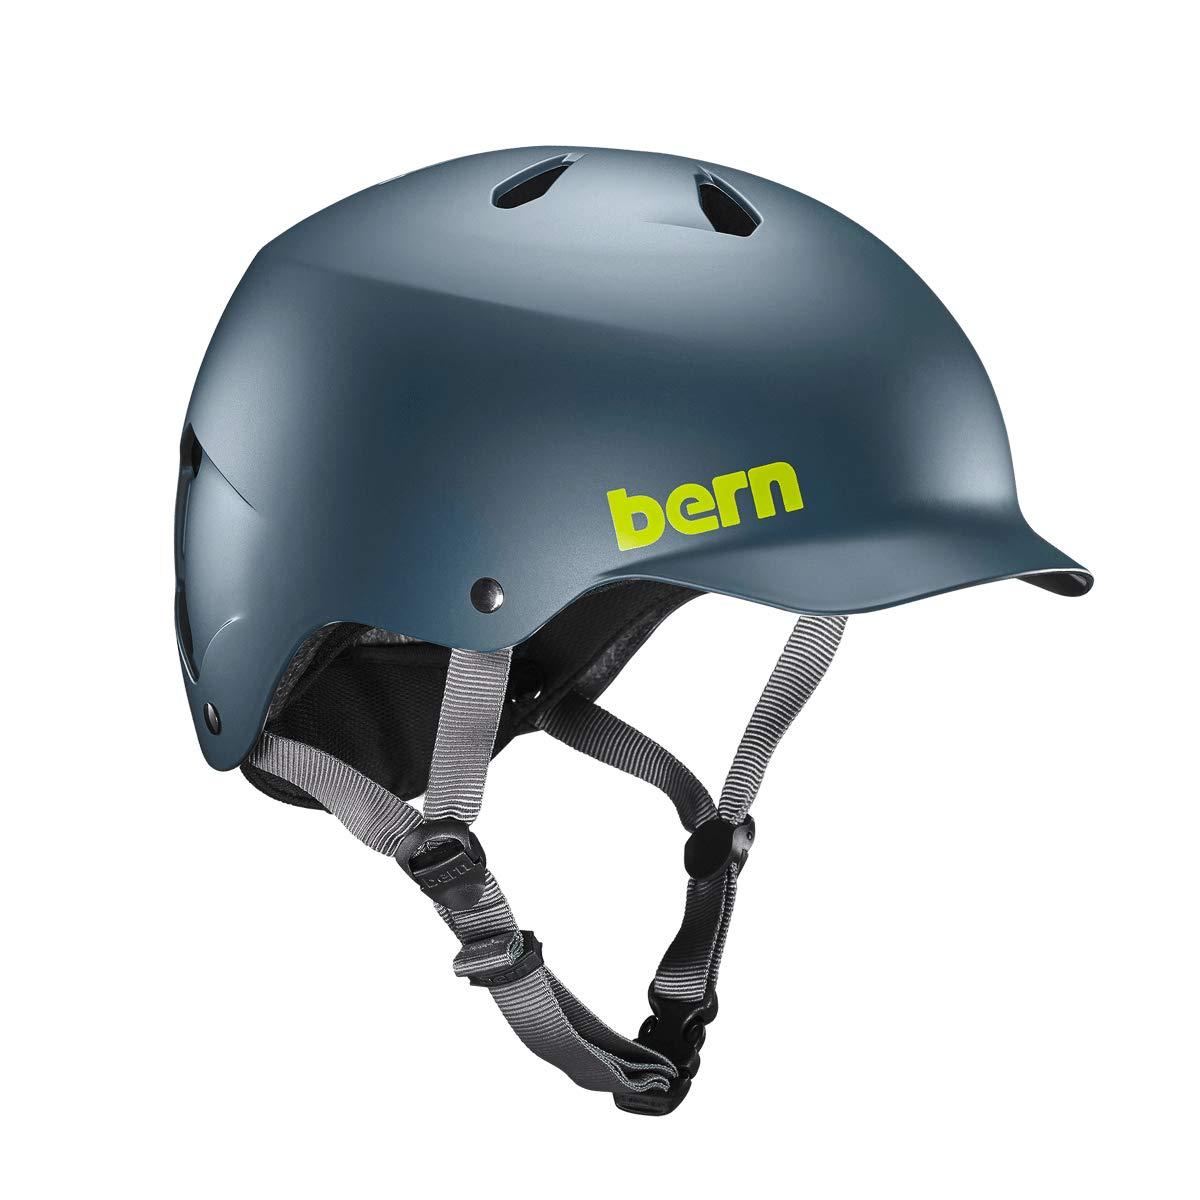 Bern Unlimited Watts EPS Helmet (Matte Muted Teal, Small)